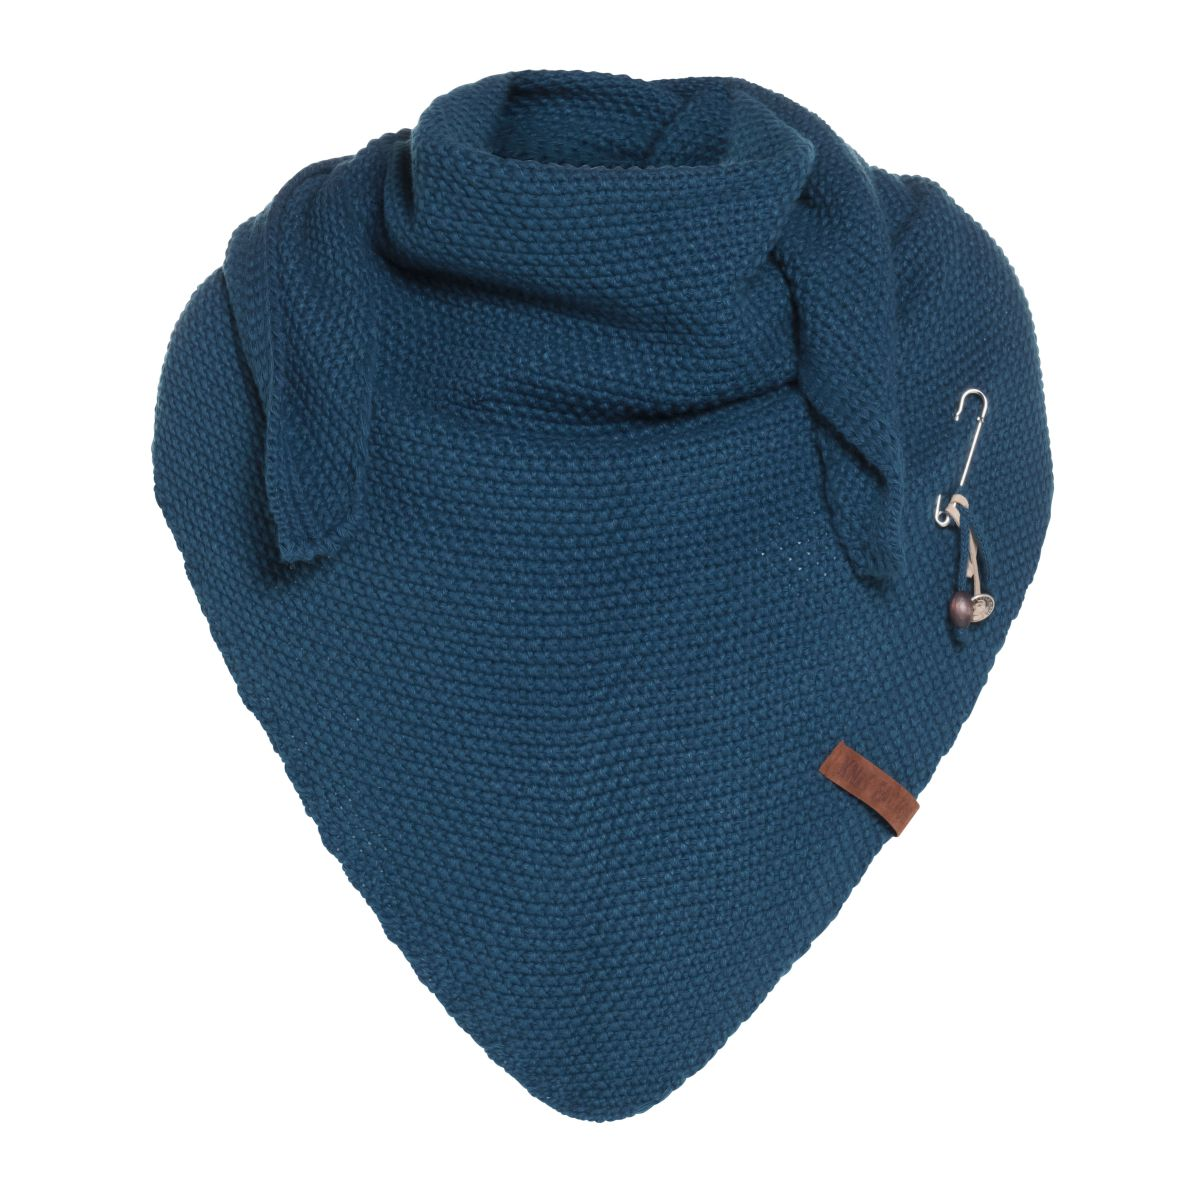 knit factory 1206008 coco omslagdoek petrol 1